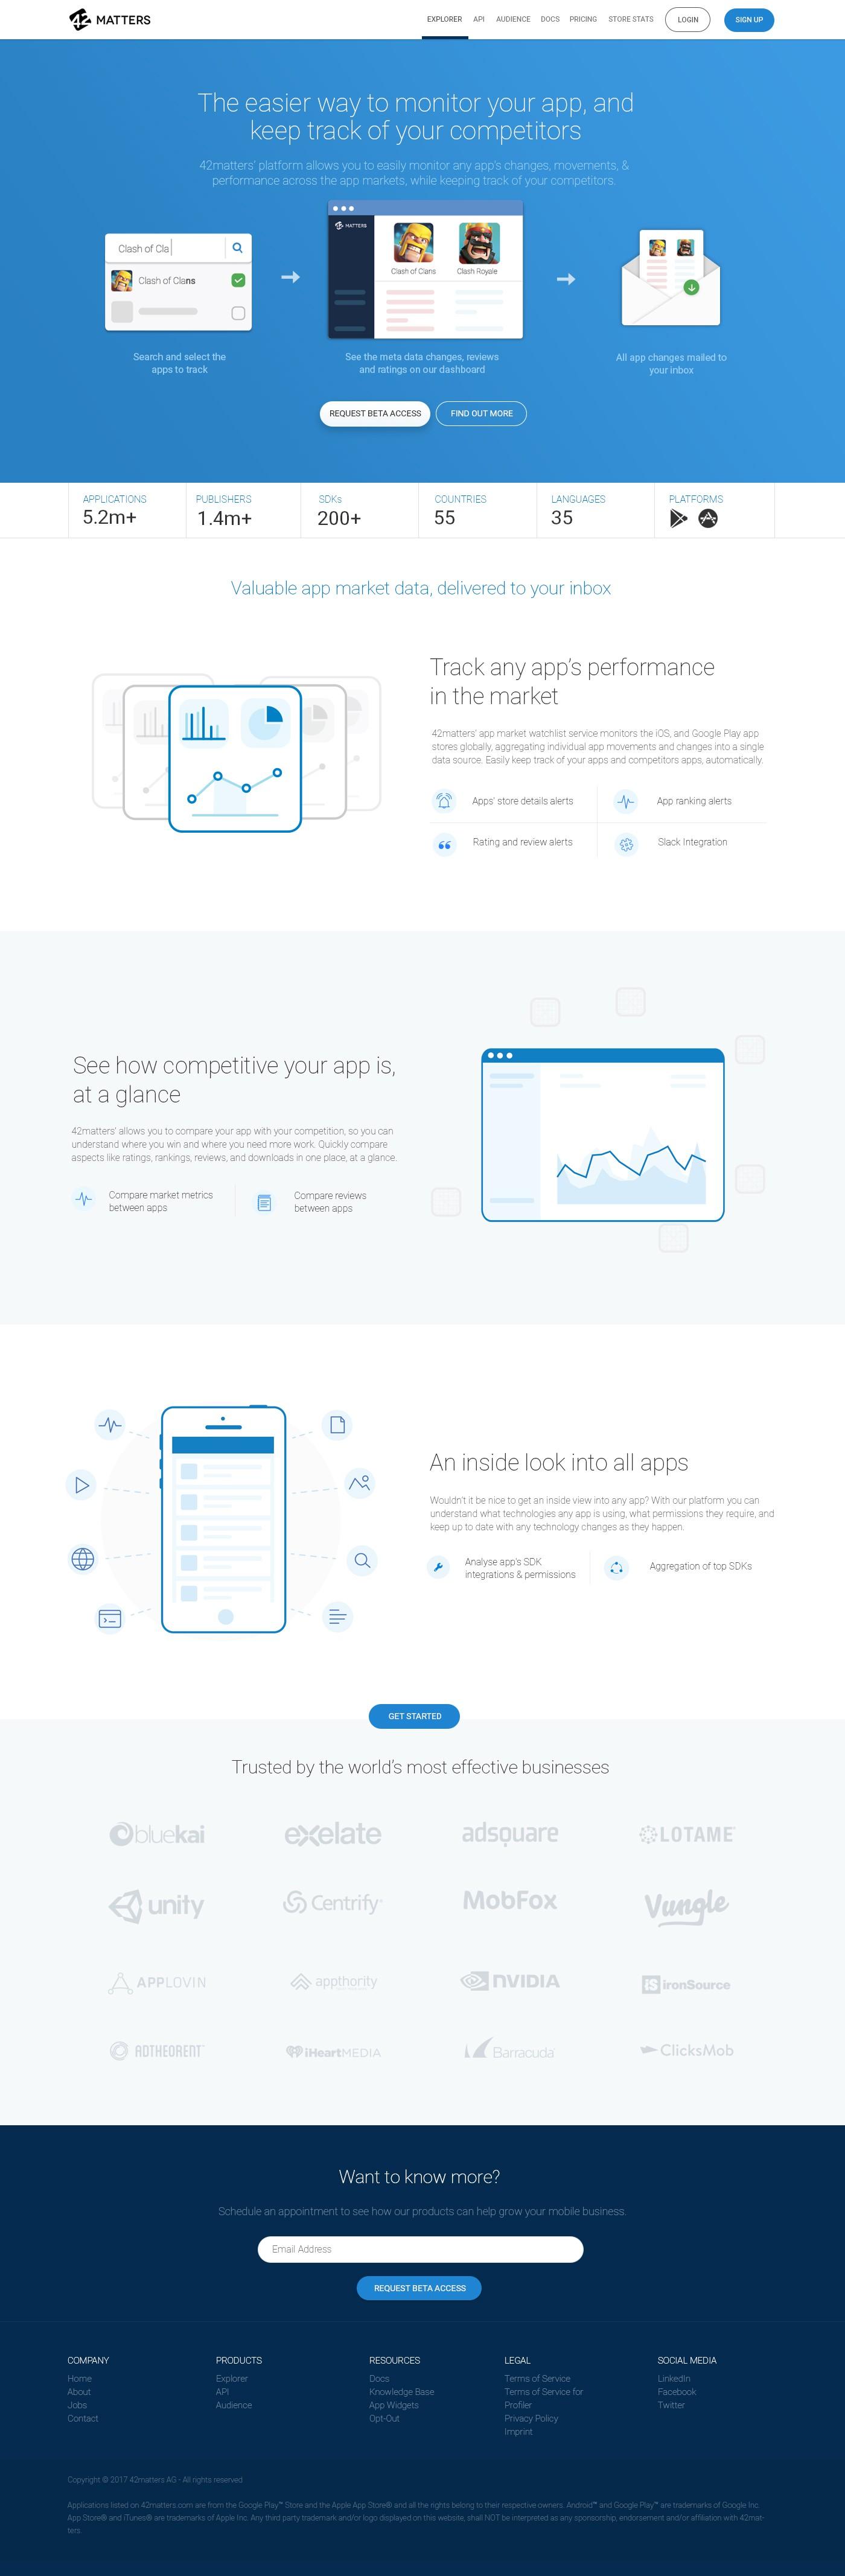 42matters App Market Watchlist Landing page